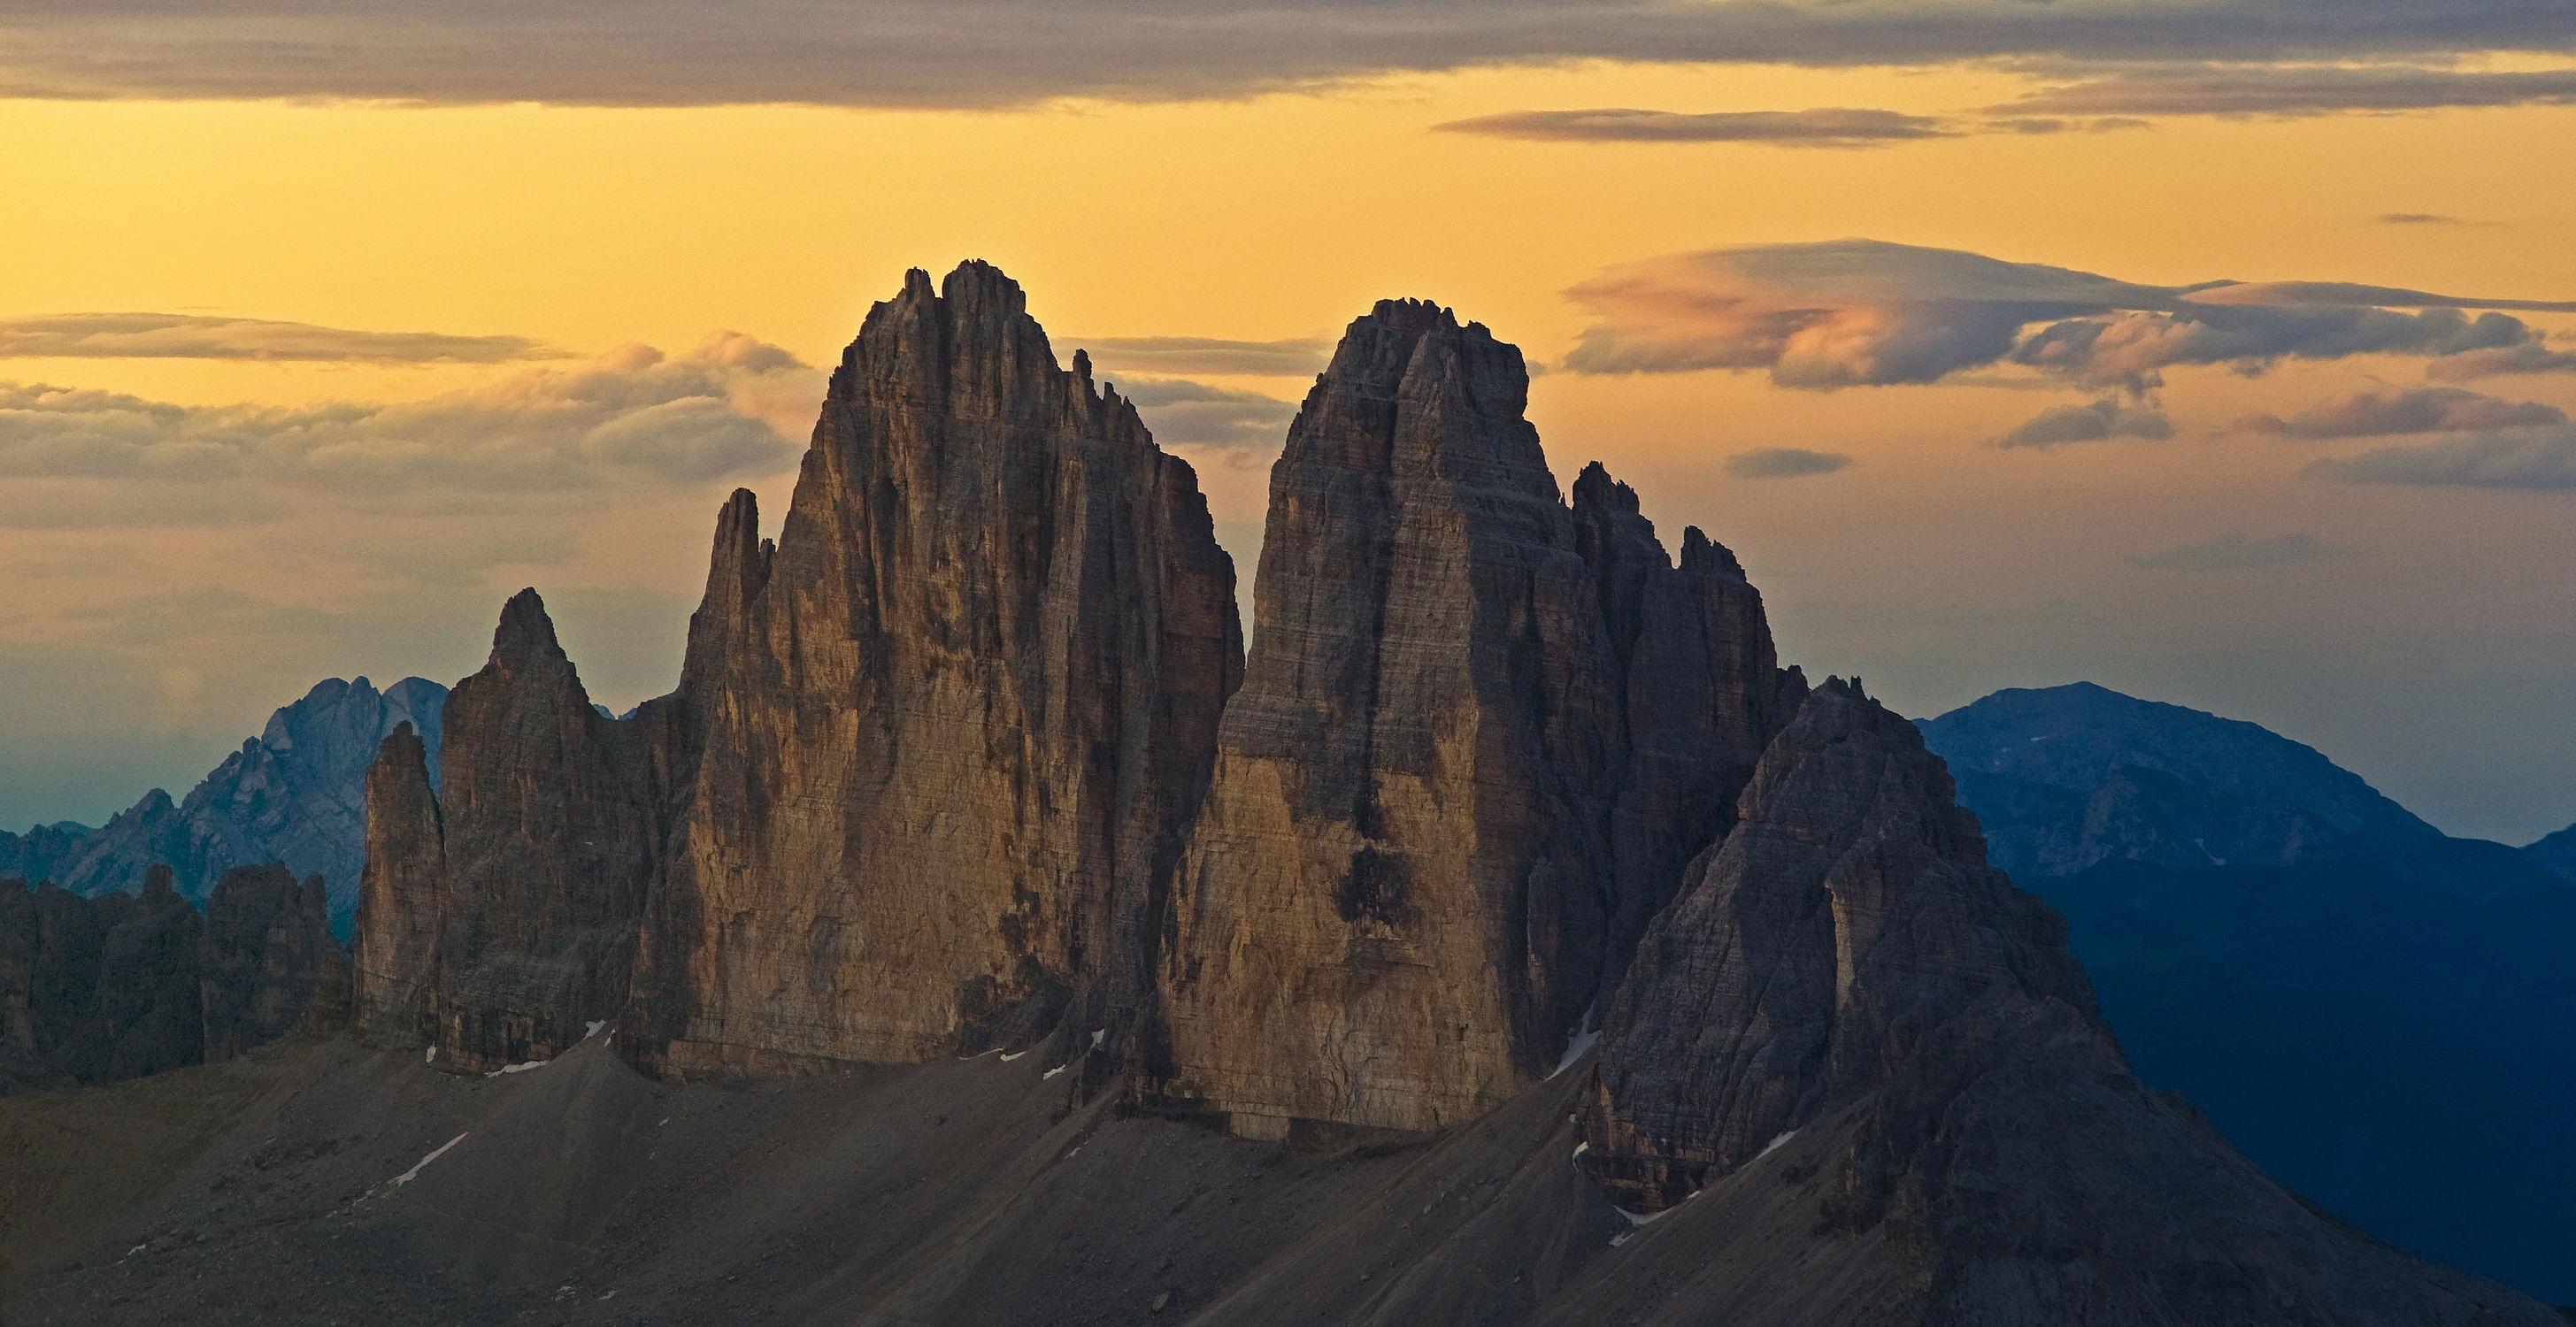 Bild mit Süd-Tirol